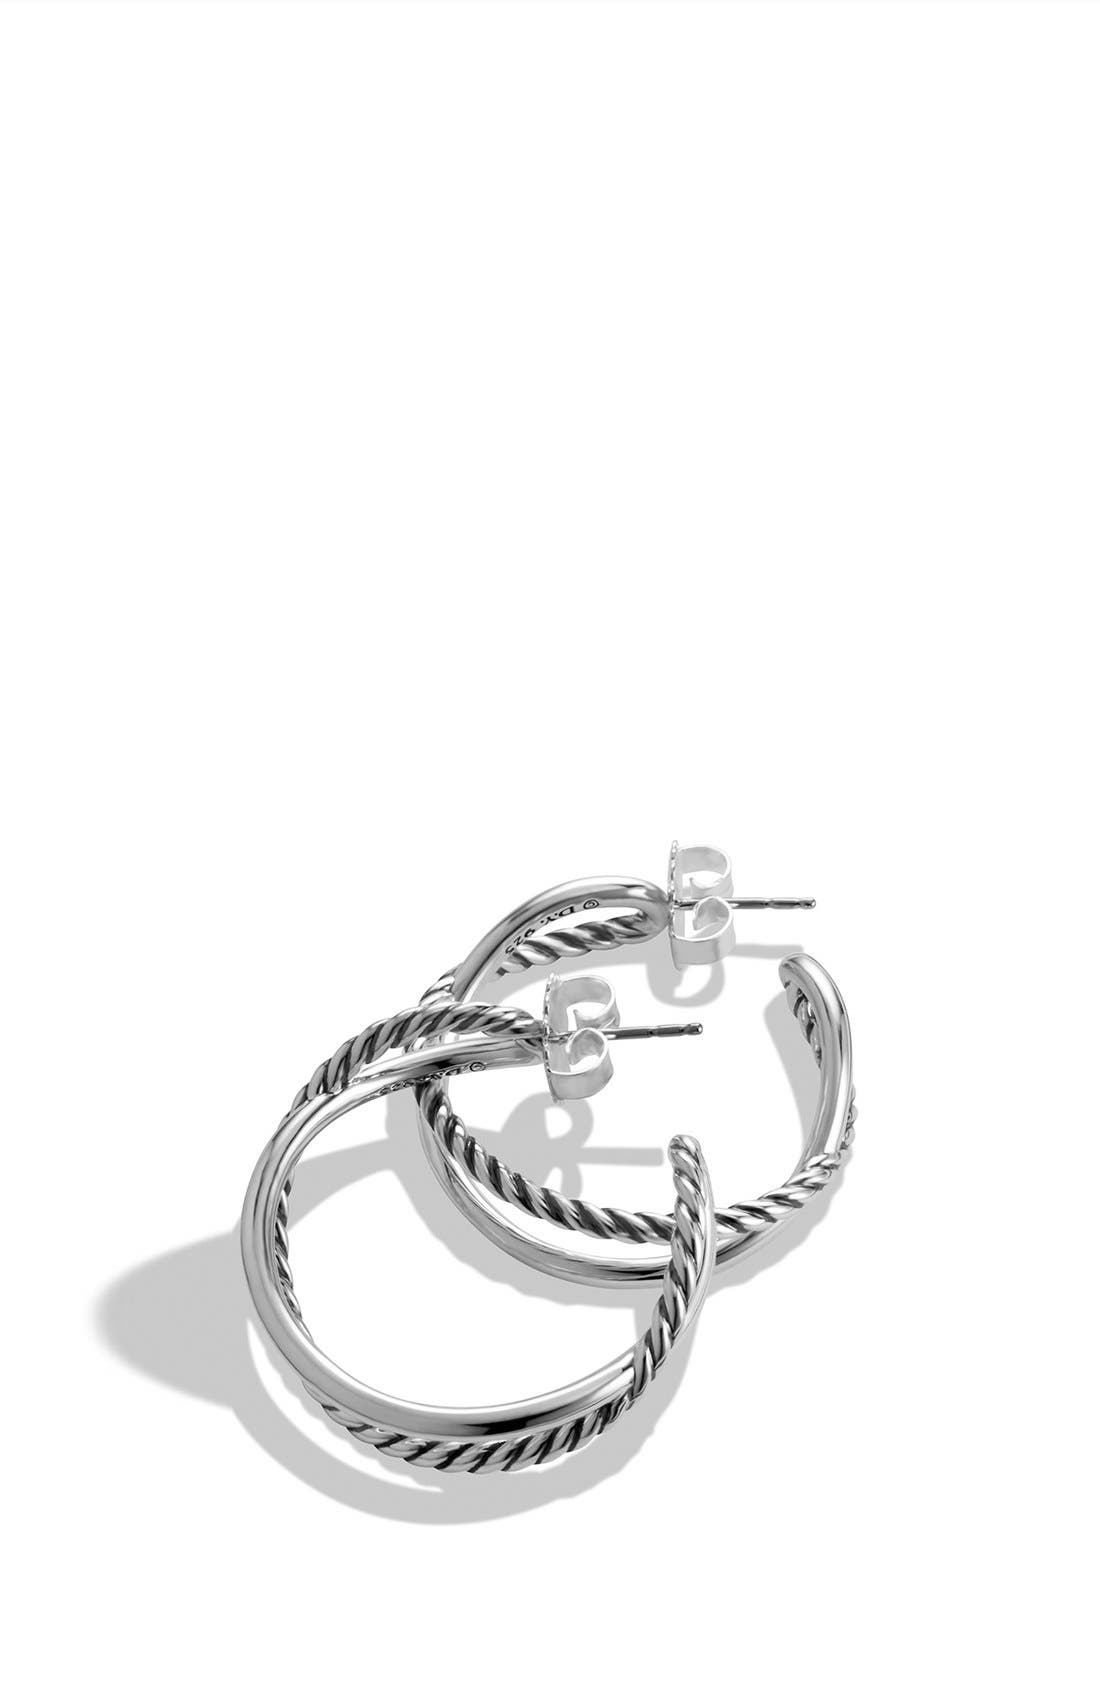 'Crossover' Hoop Earrings,                             Alternate thumbnail 2, color,                             Silver